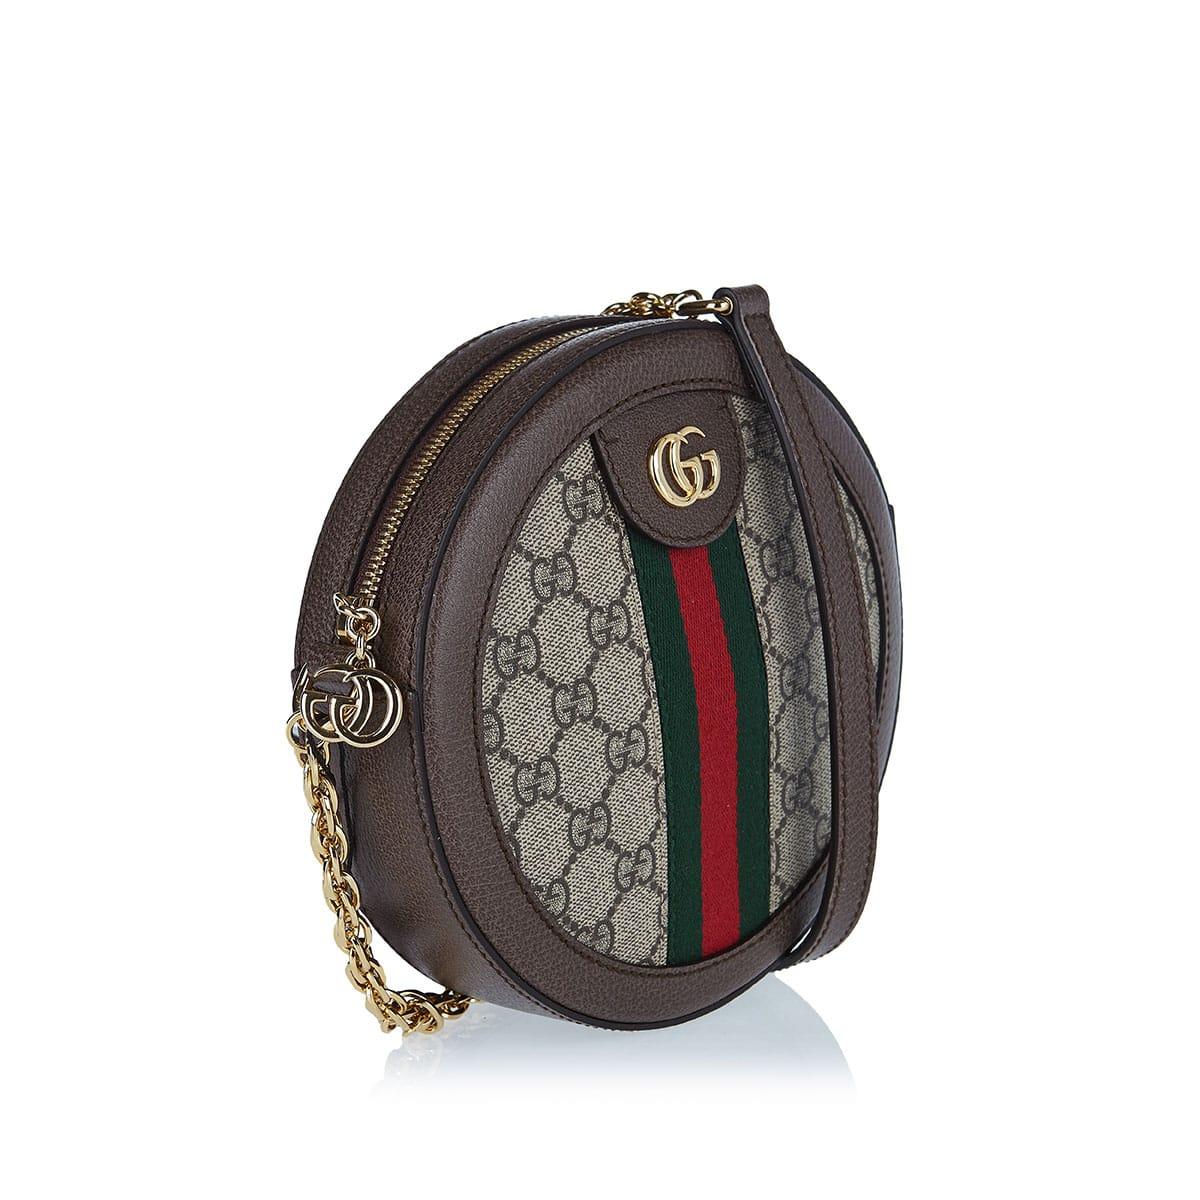 Ophidia GG mini round bag